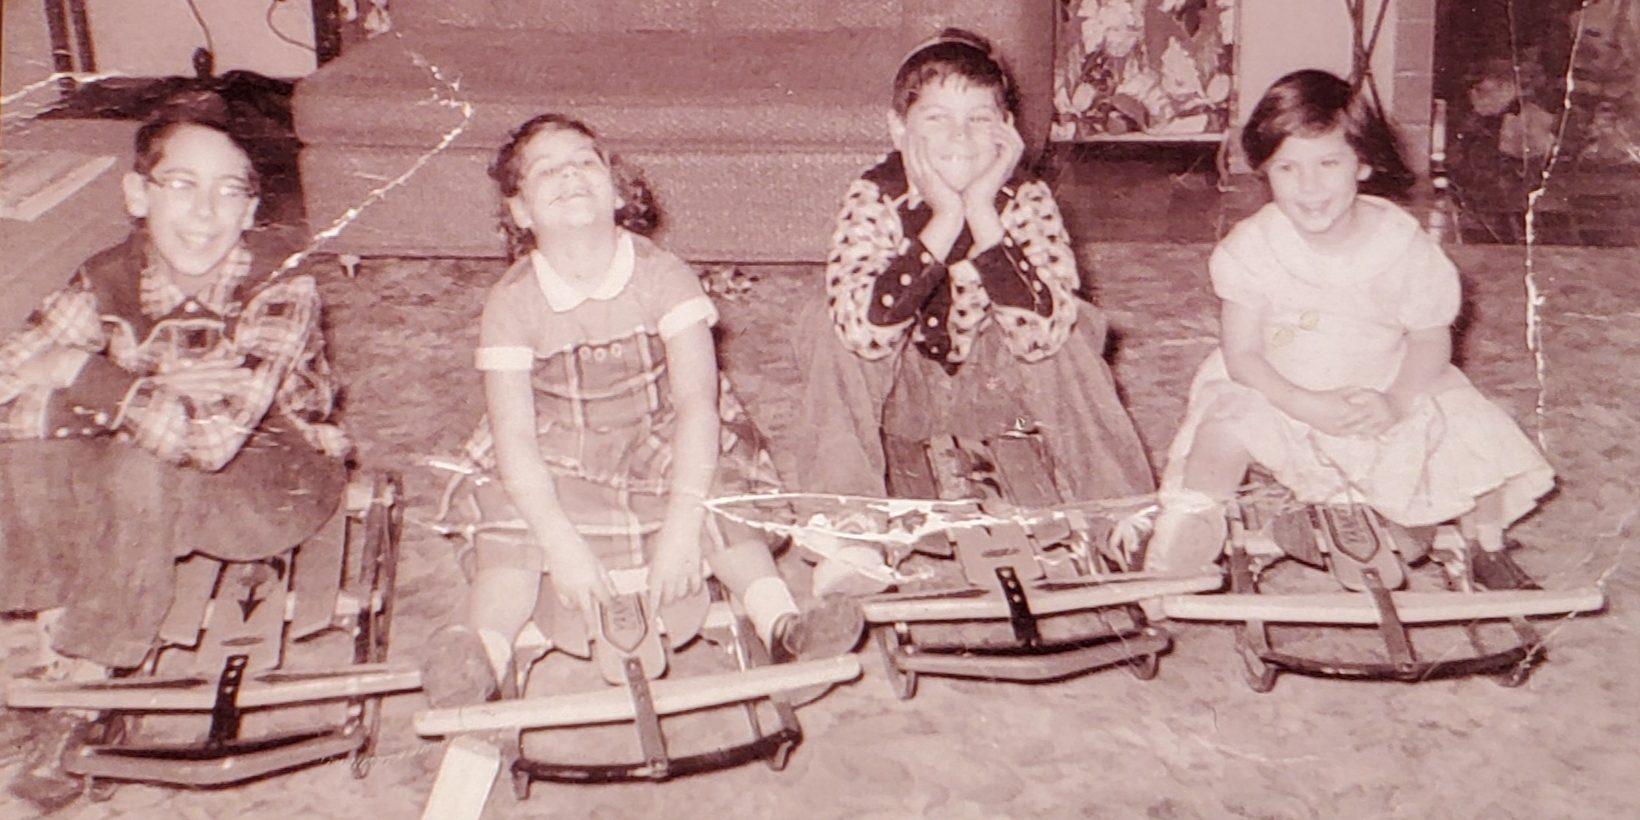 Hanukkah Evokes Memories of Childhood